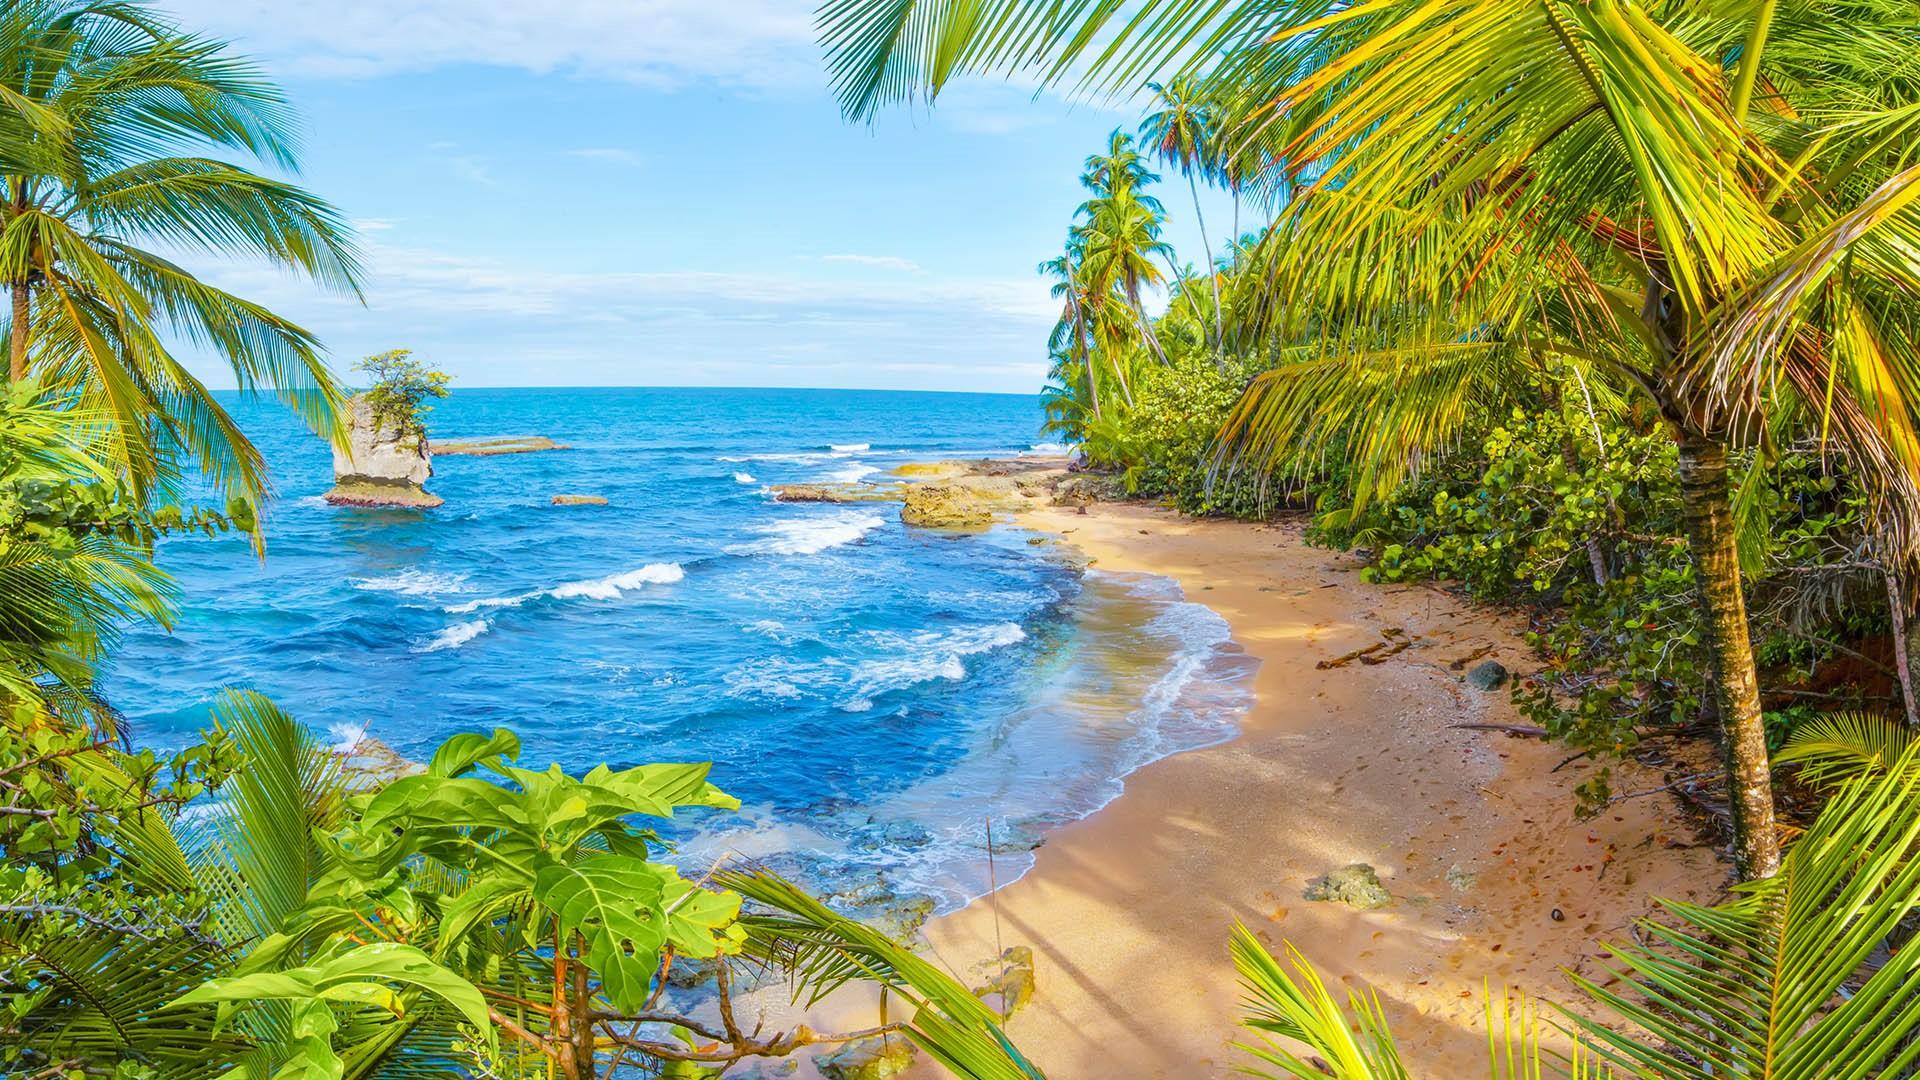 Manzanillo Wildlife Refuge Beach Limon Costa Rica Windows 10 Spotlight Images